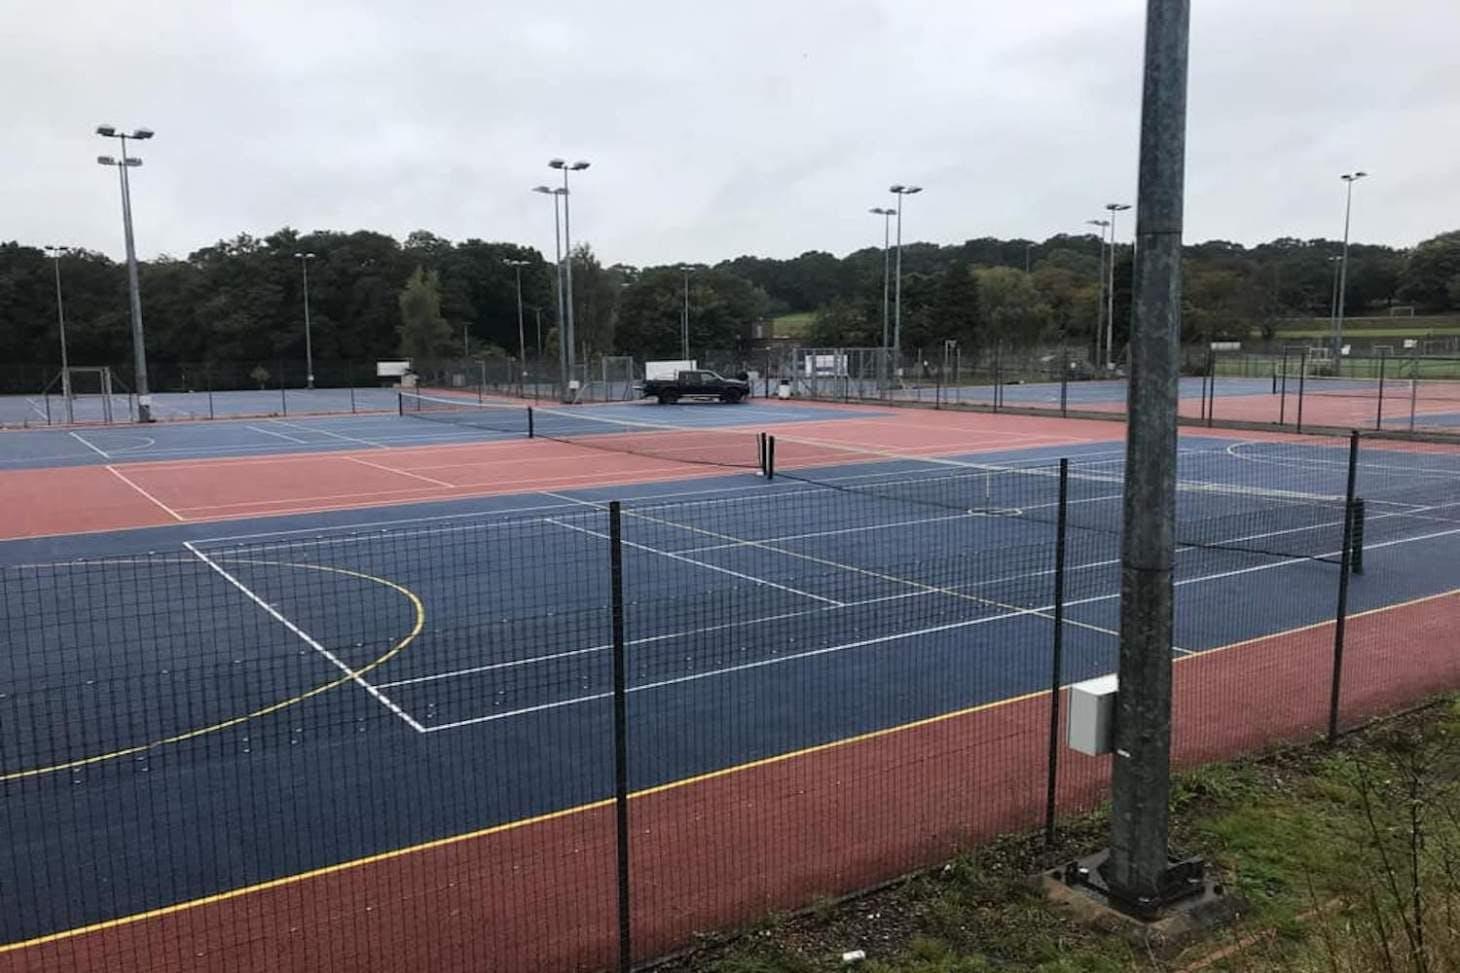 Southampton Outdoor Sports Centre Outdoor | Hard (macadam) tennis court